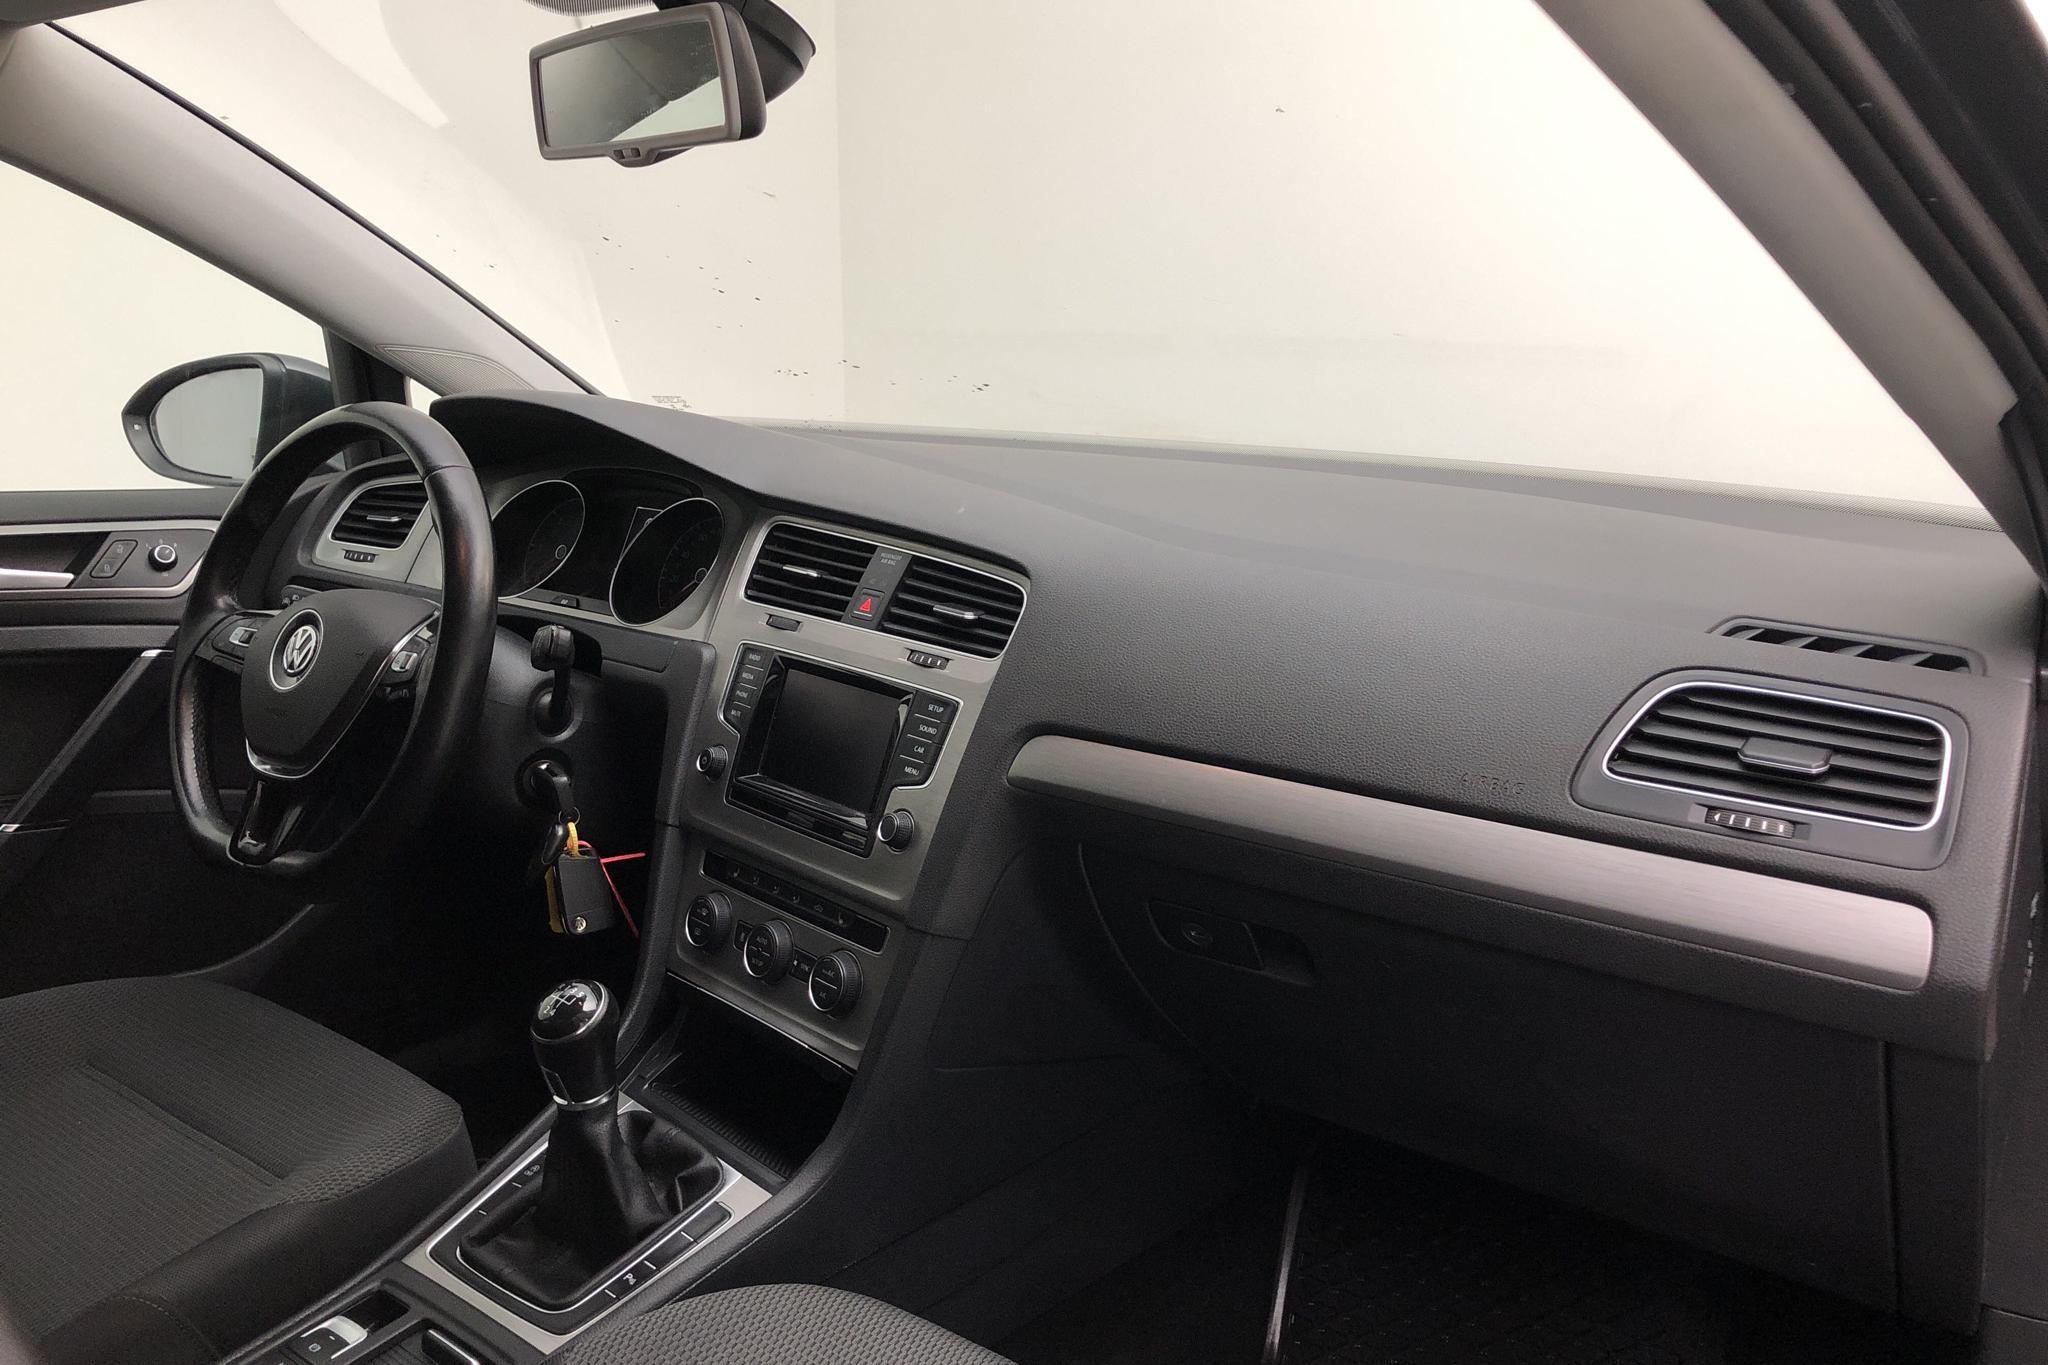 VW Golf VII 1.6 TDI BlueMotion Technology Sportscombi (105hk) - 14 128 mil - Manuell - Dark Grey - 2014